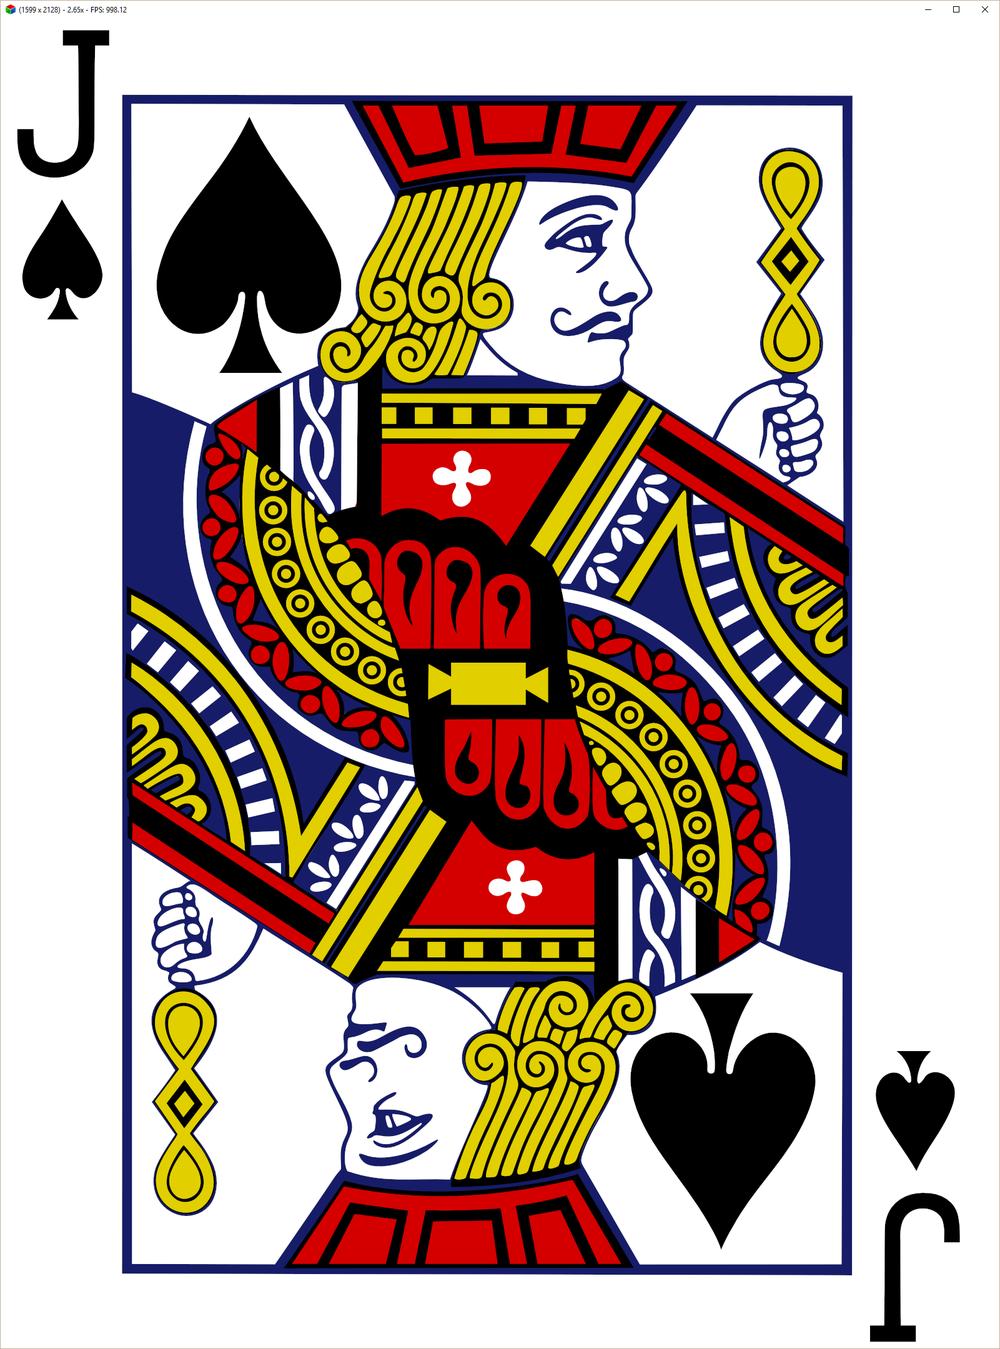 jack_of_spades.png